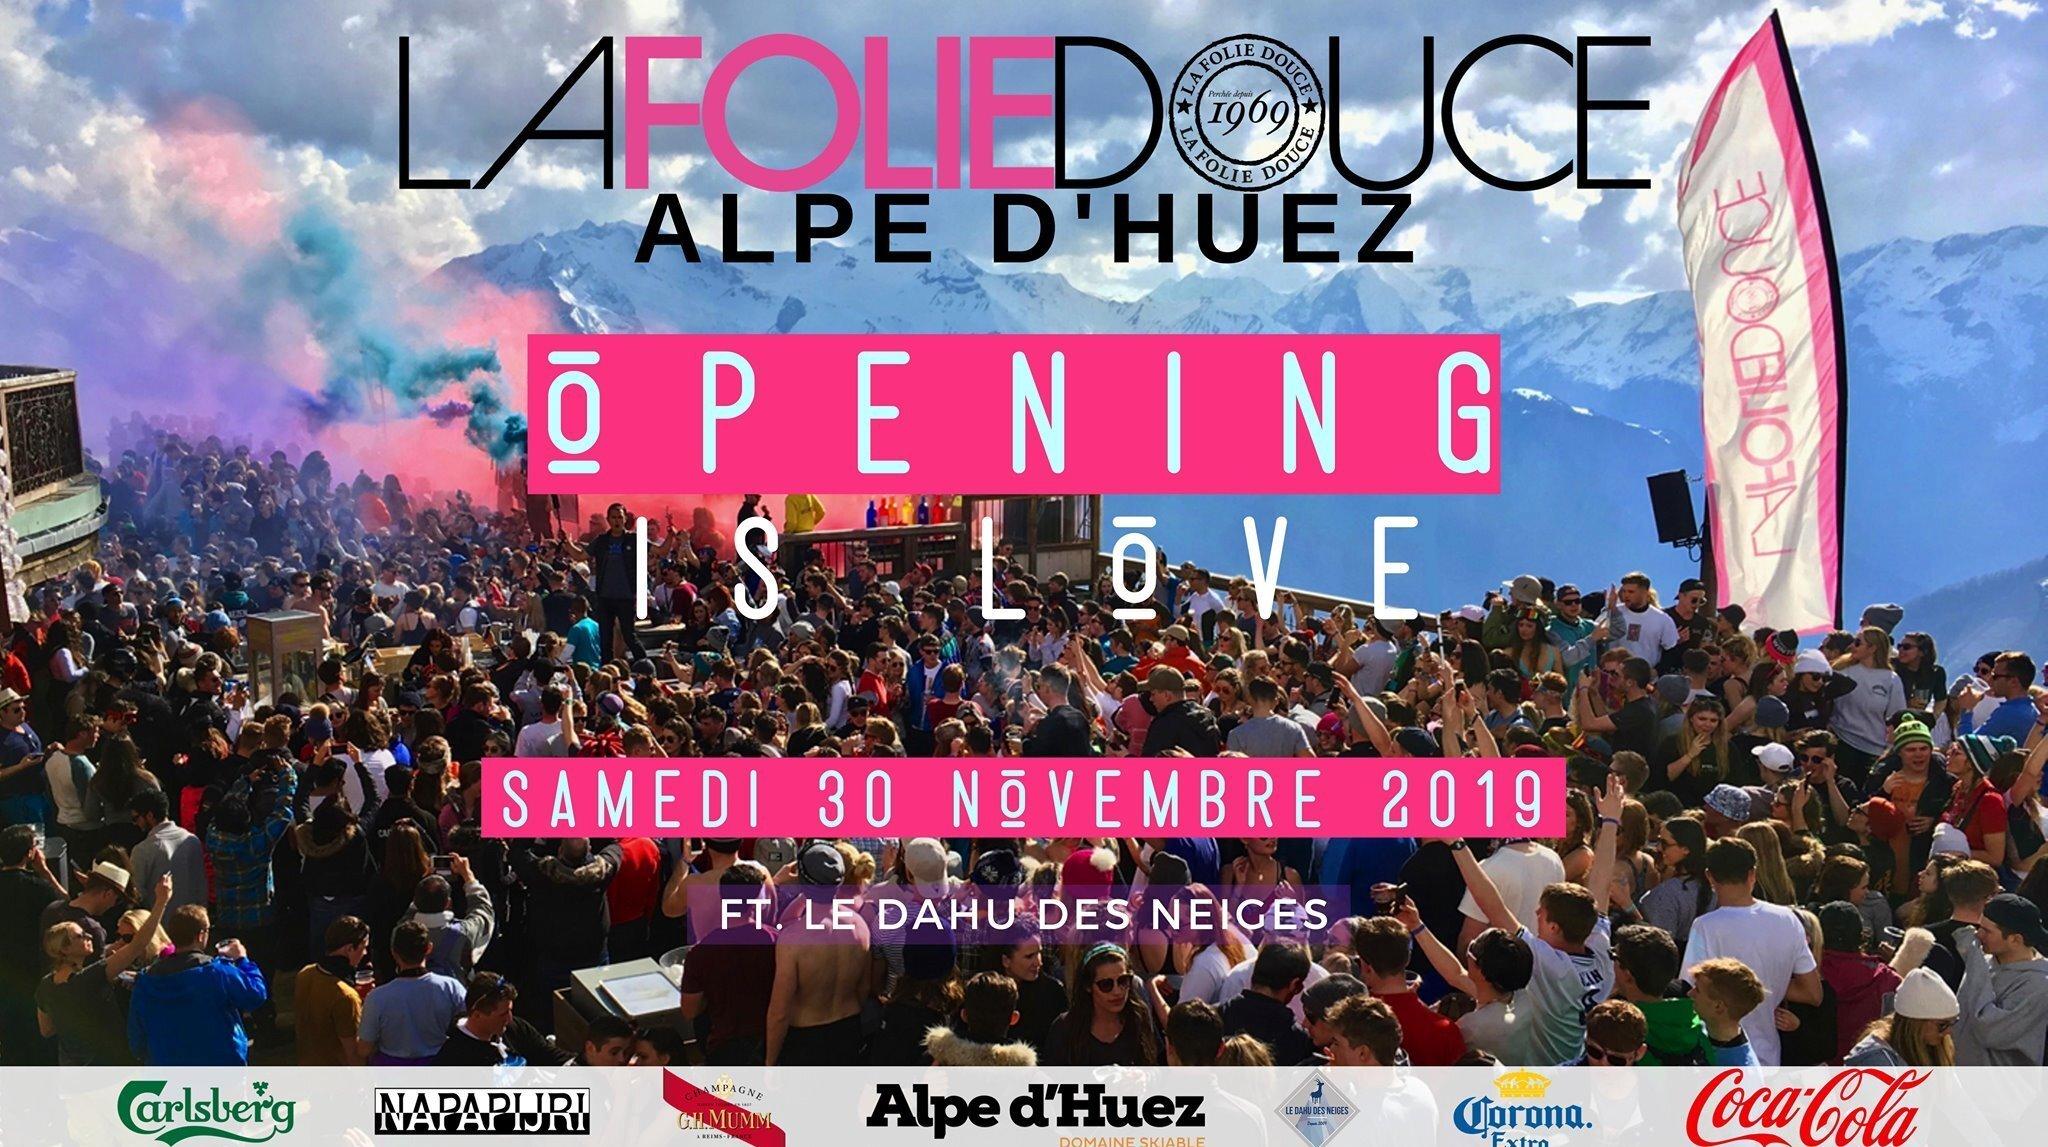 Season opening party at La Folie DOuce